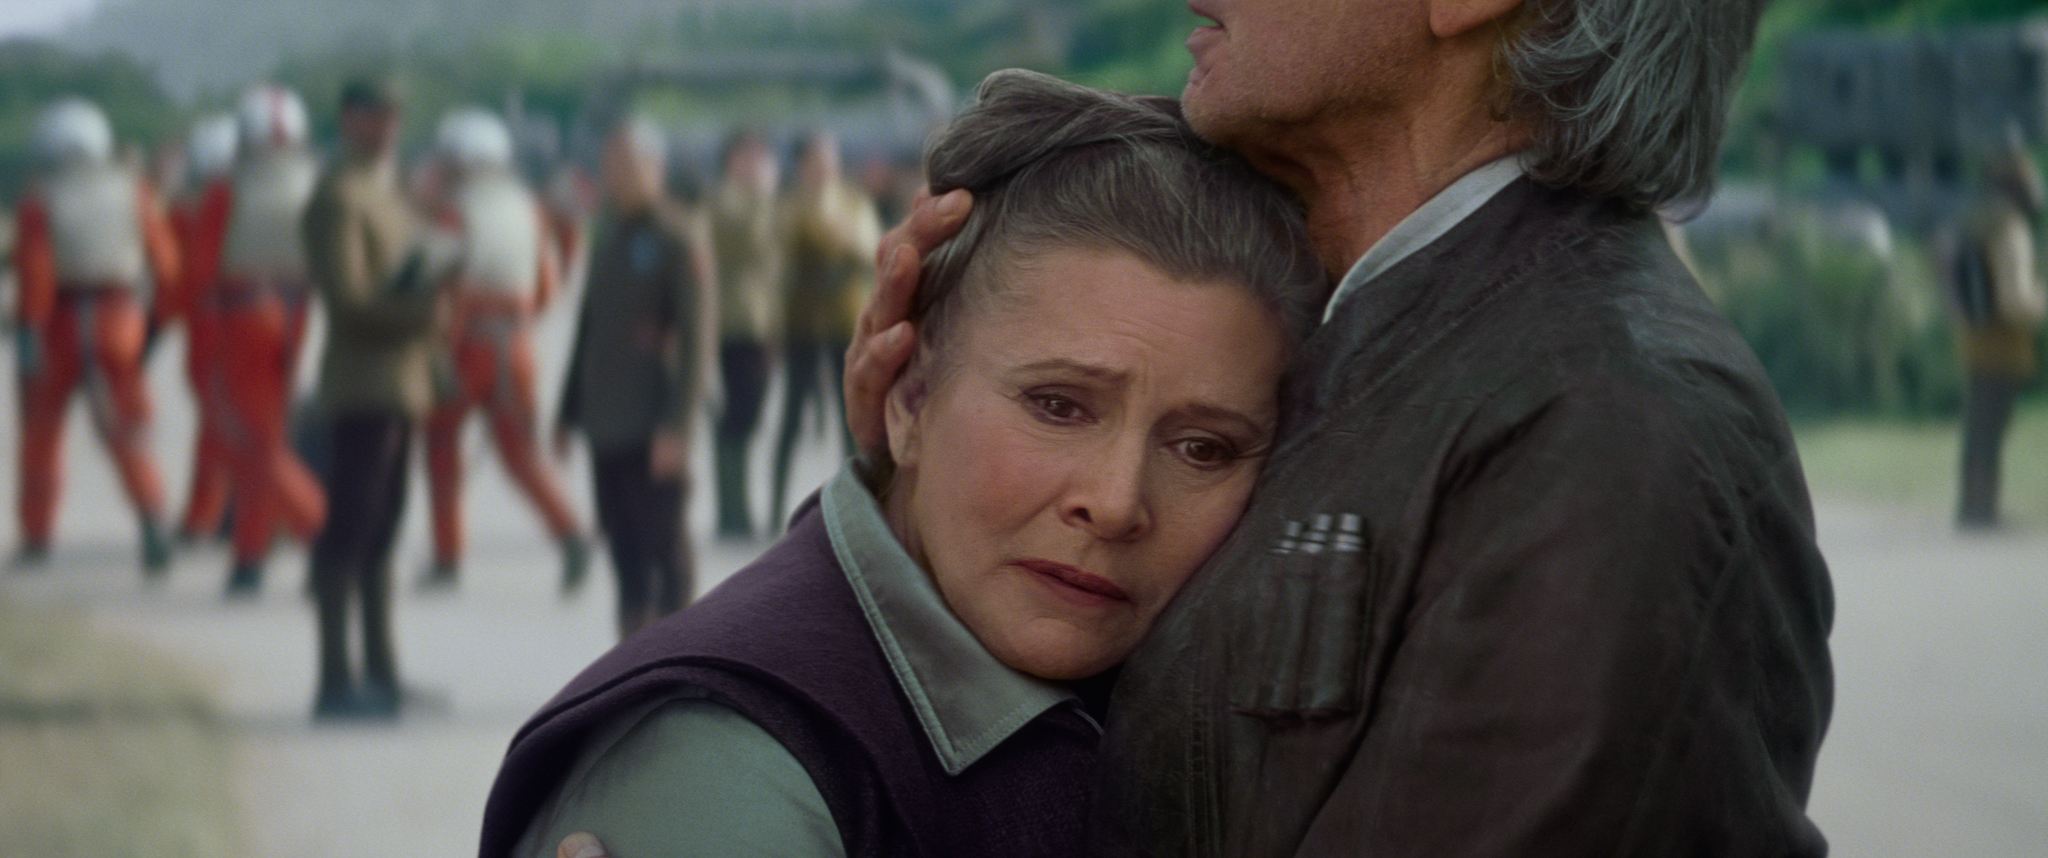 The_Force_Awakens_Leia